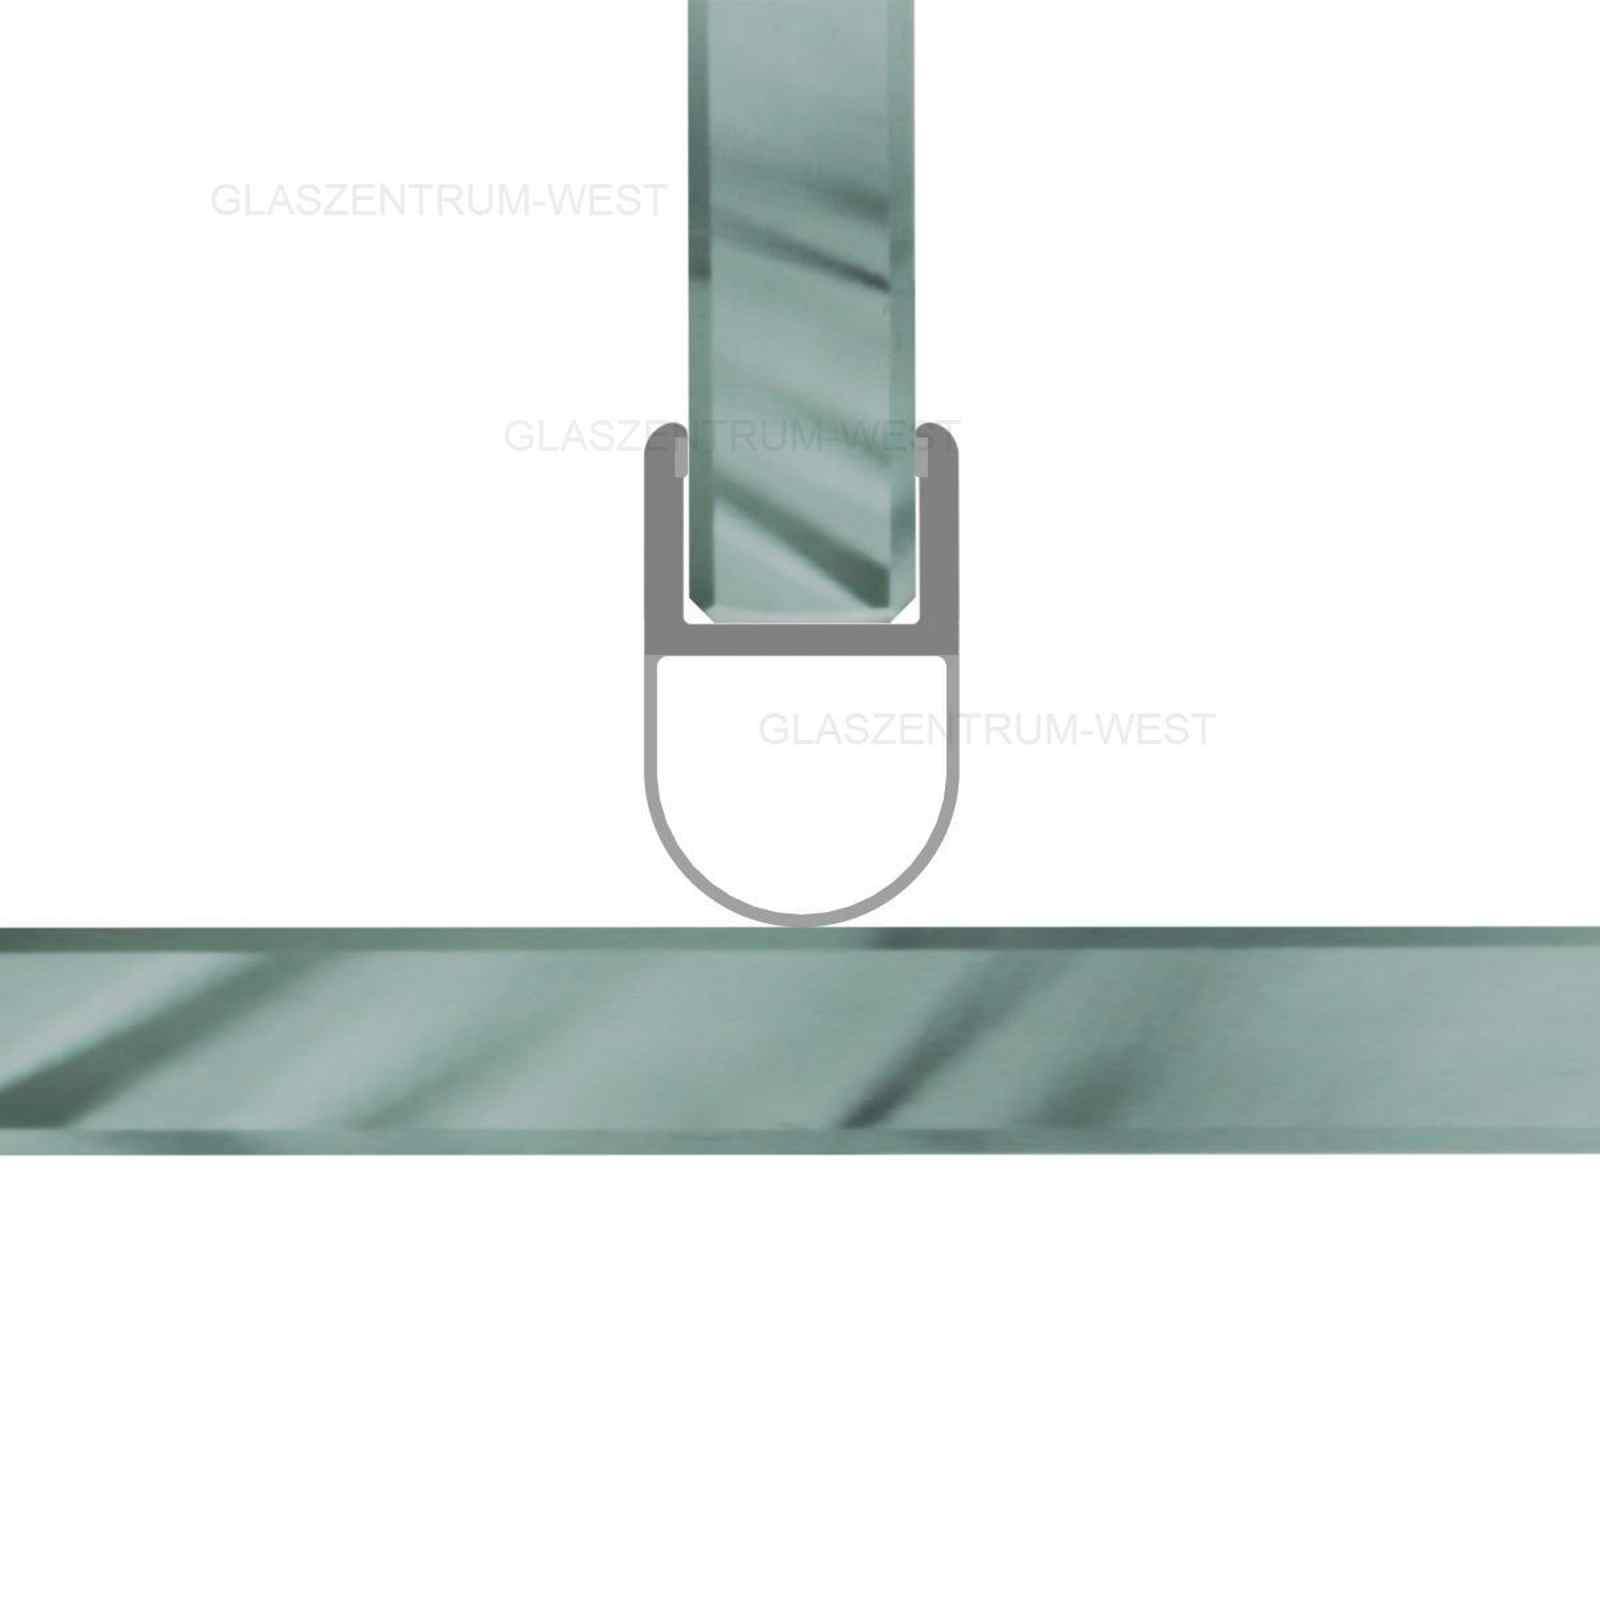 duschdichtung streifdichtung balgdichtung dusche profil. Black Bedroom Furniture Sets. Home Design Ideas